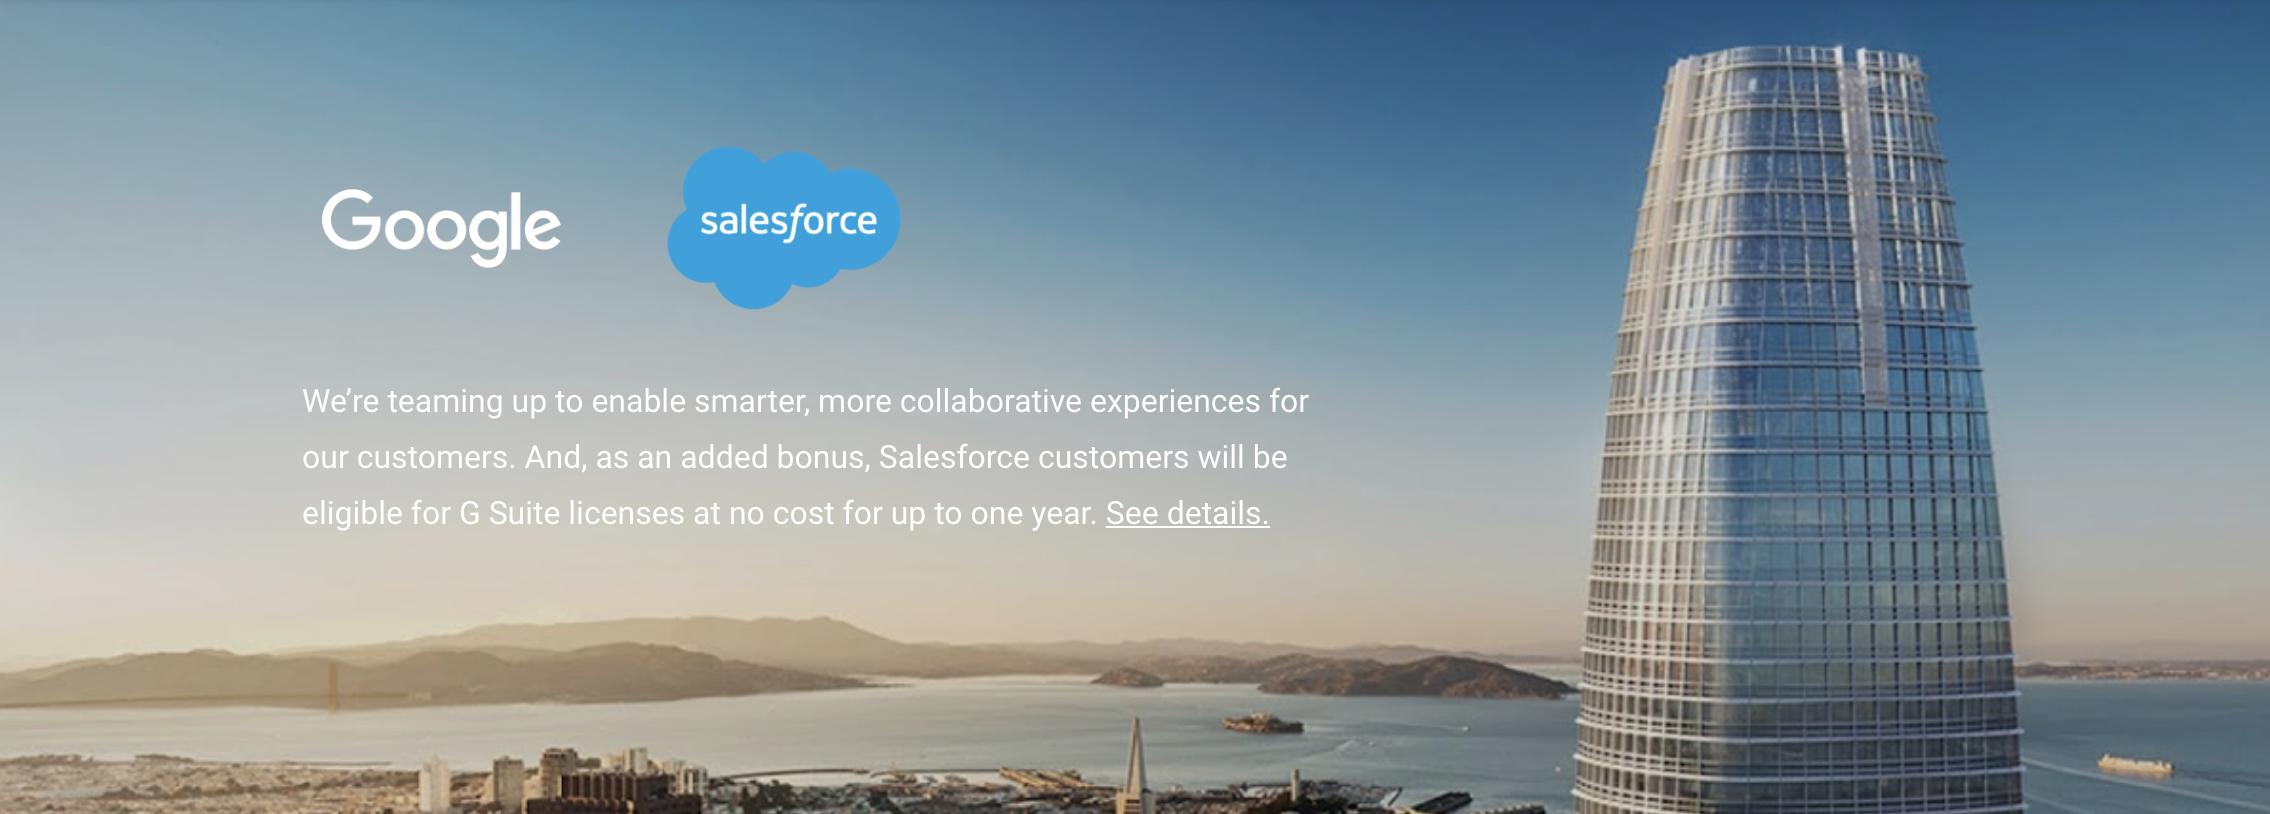 Google Analytics 360 & Marketing Cloud Integration is here!